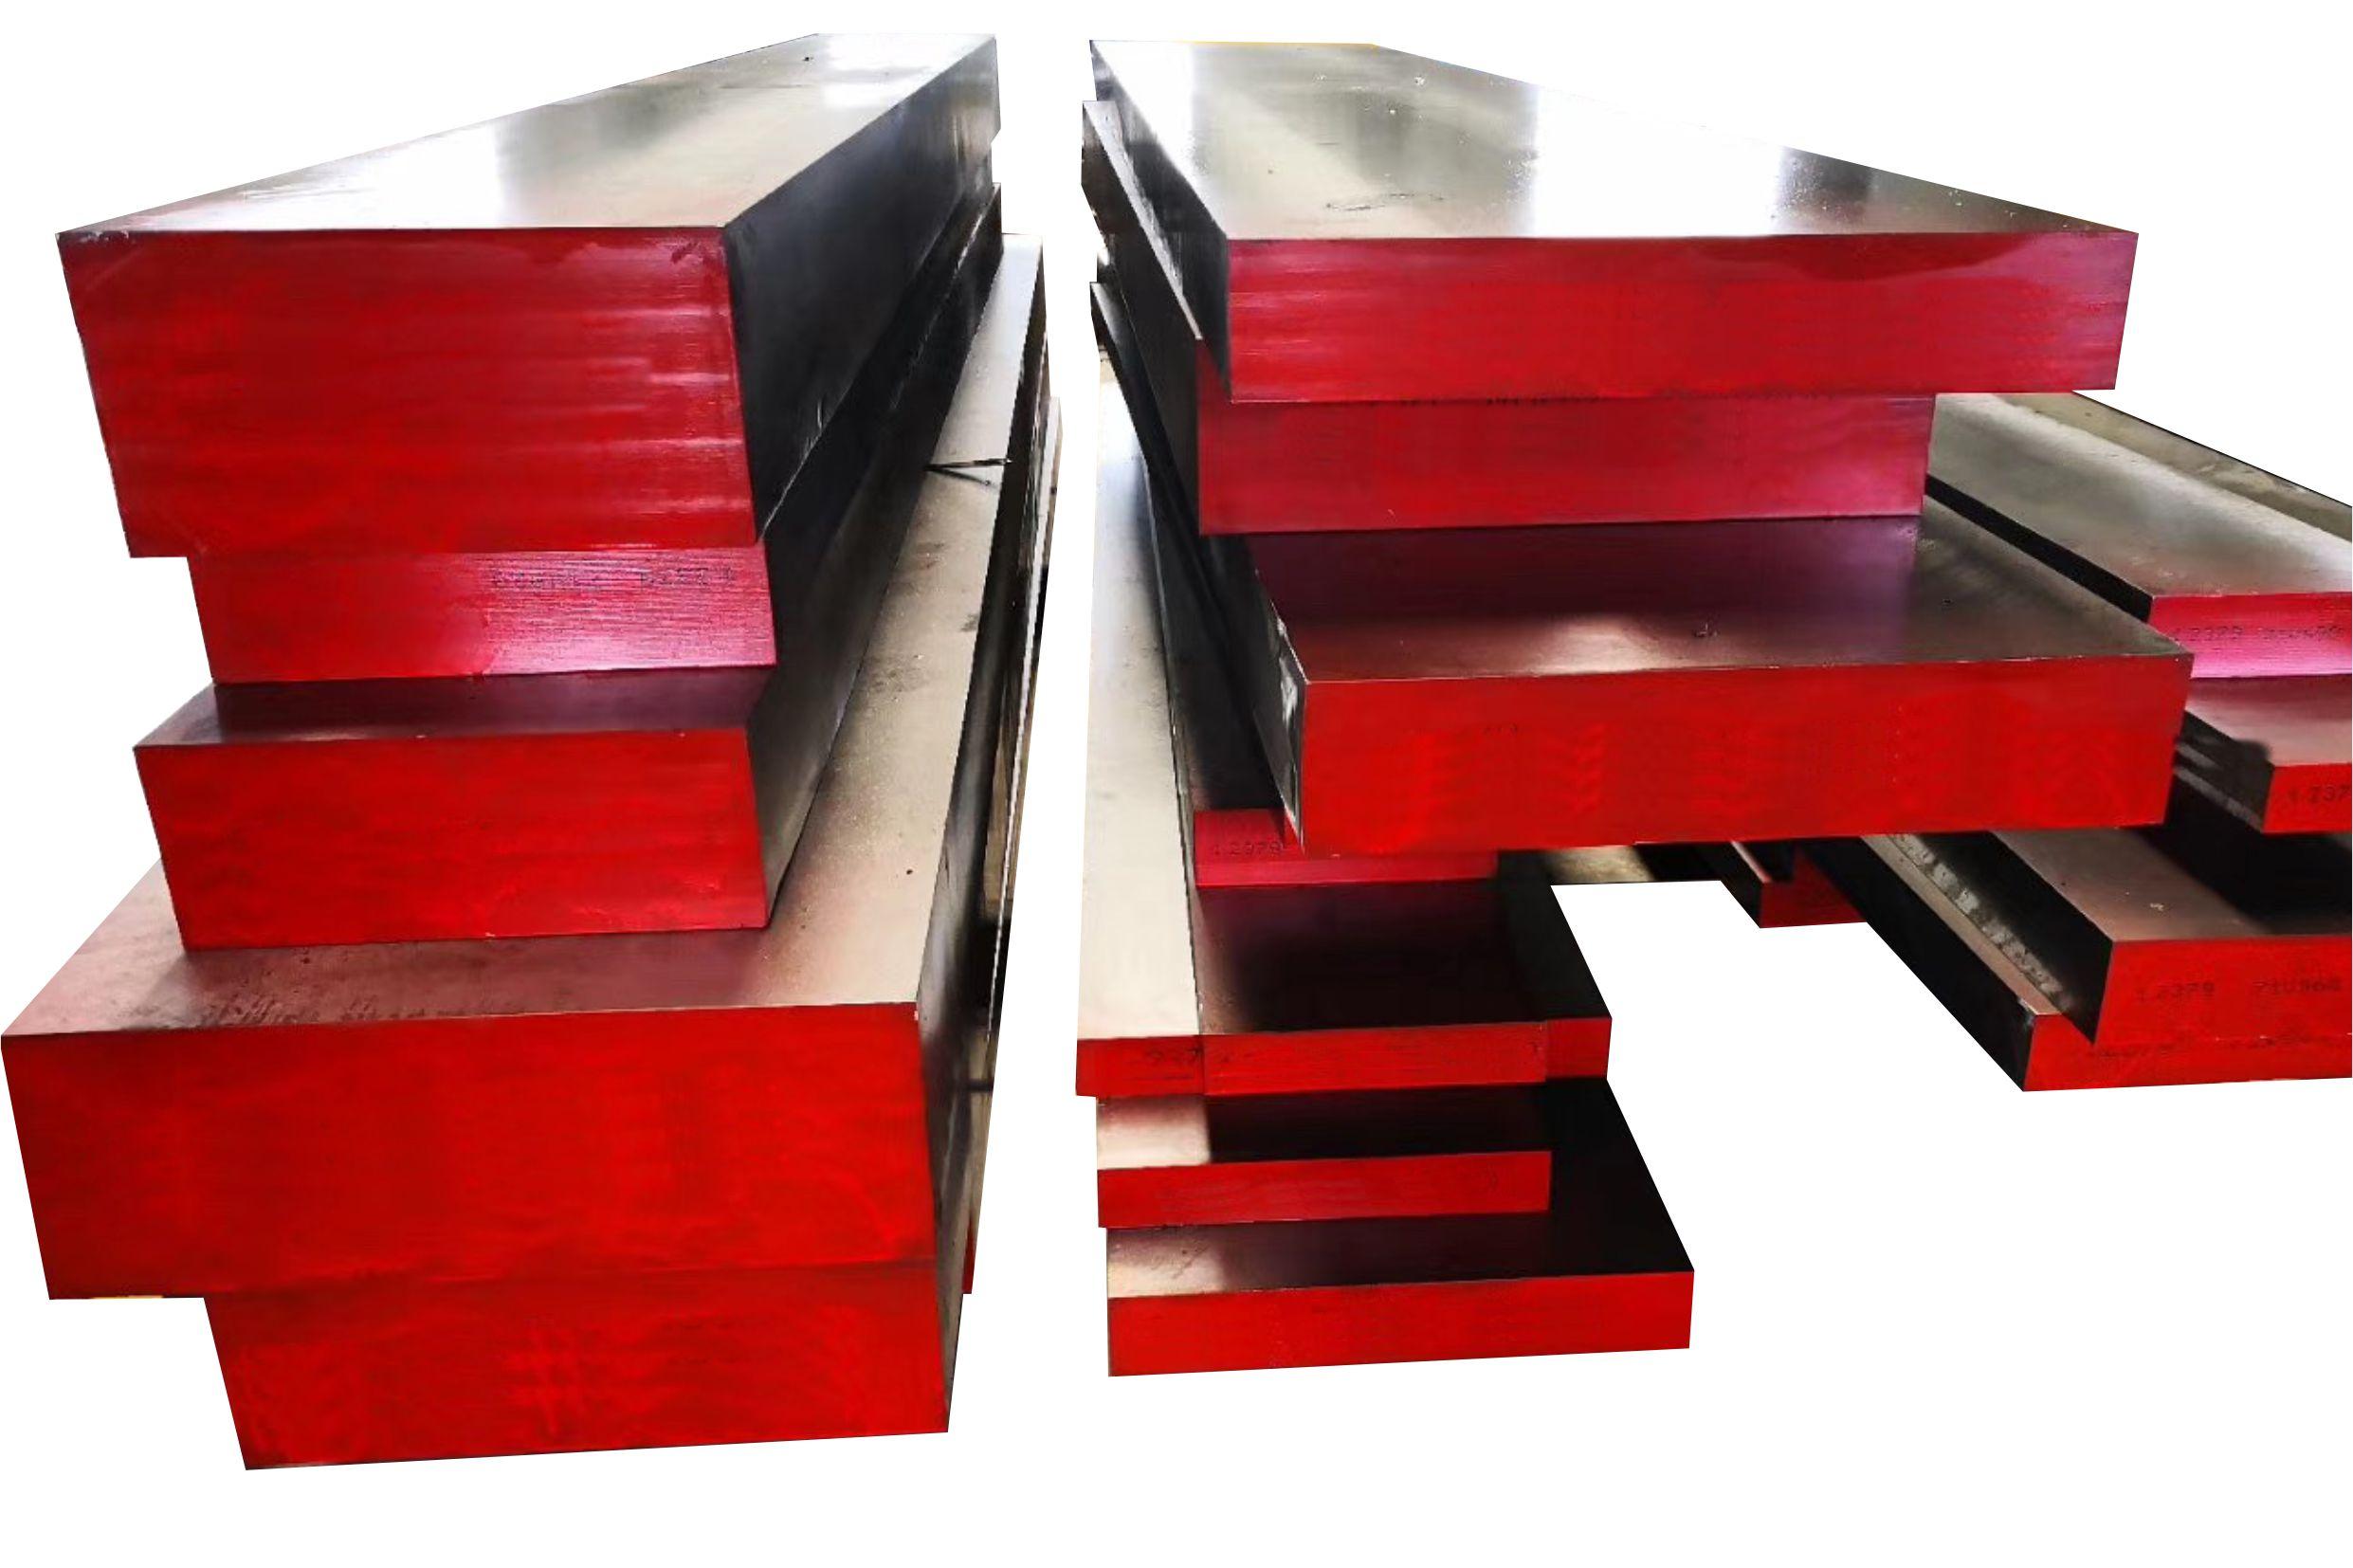 d2 tool steel blocks